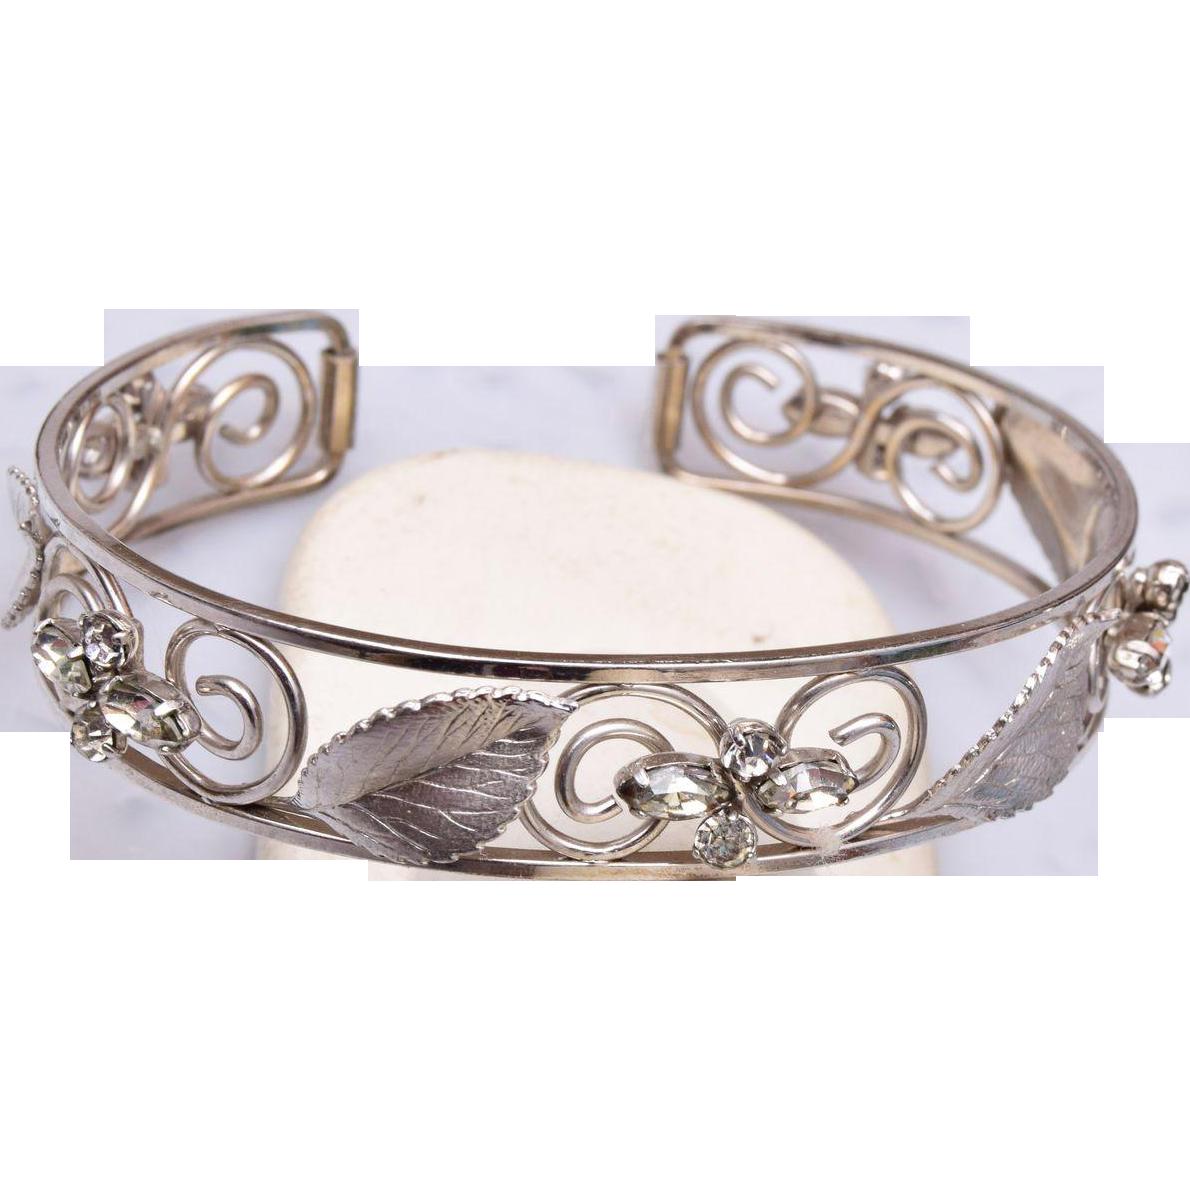 Krementz Silver Cuff Bracelet with Rhinestones